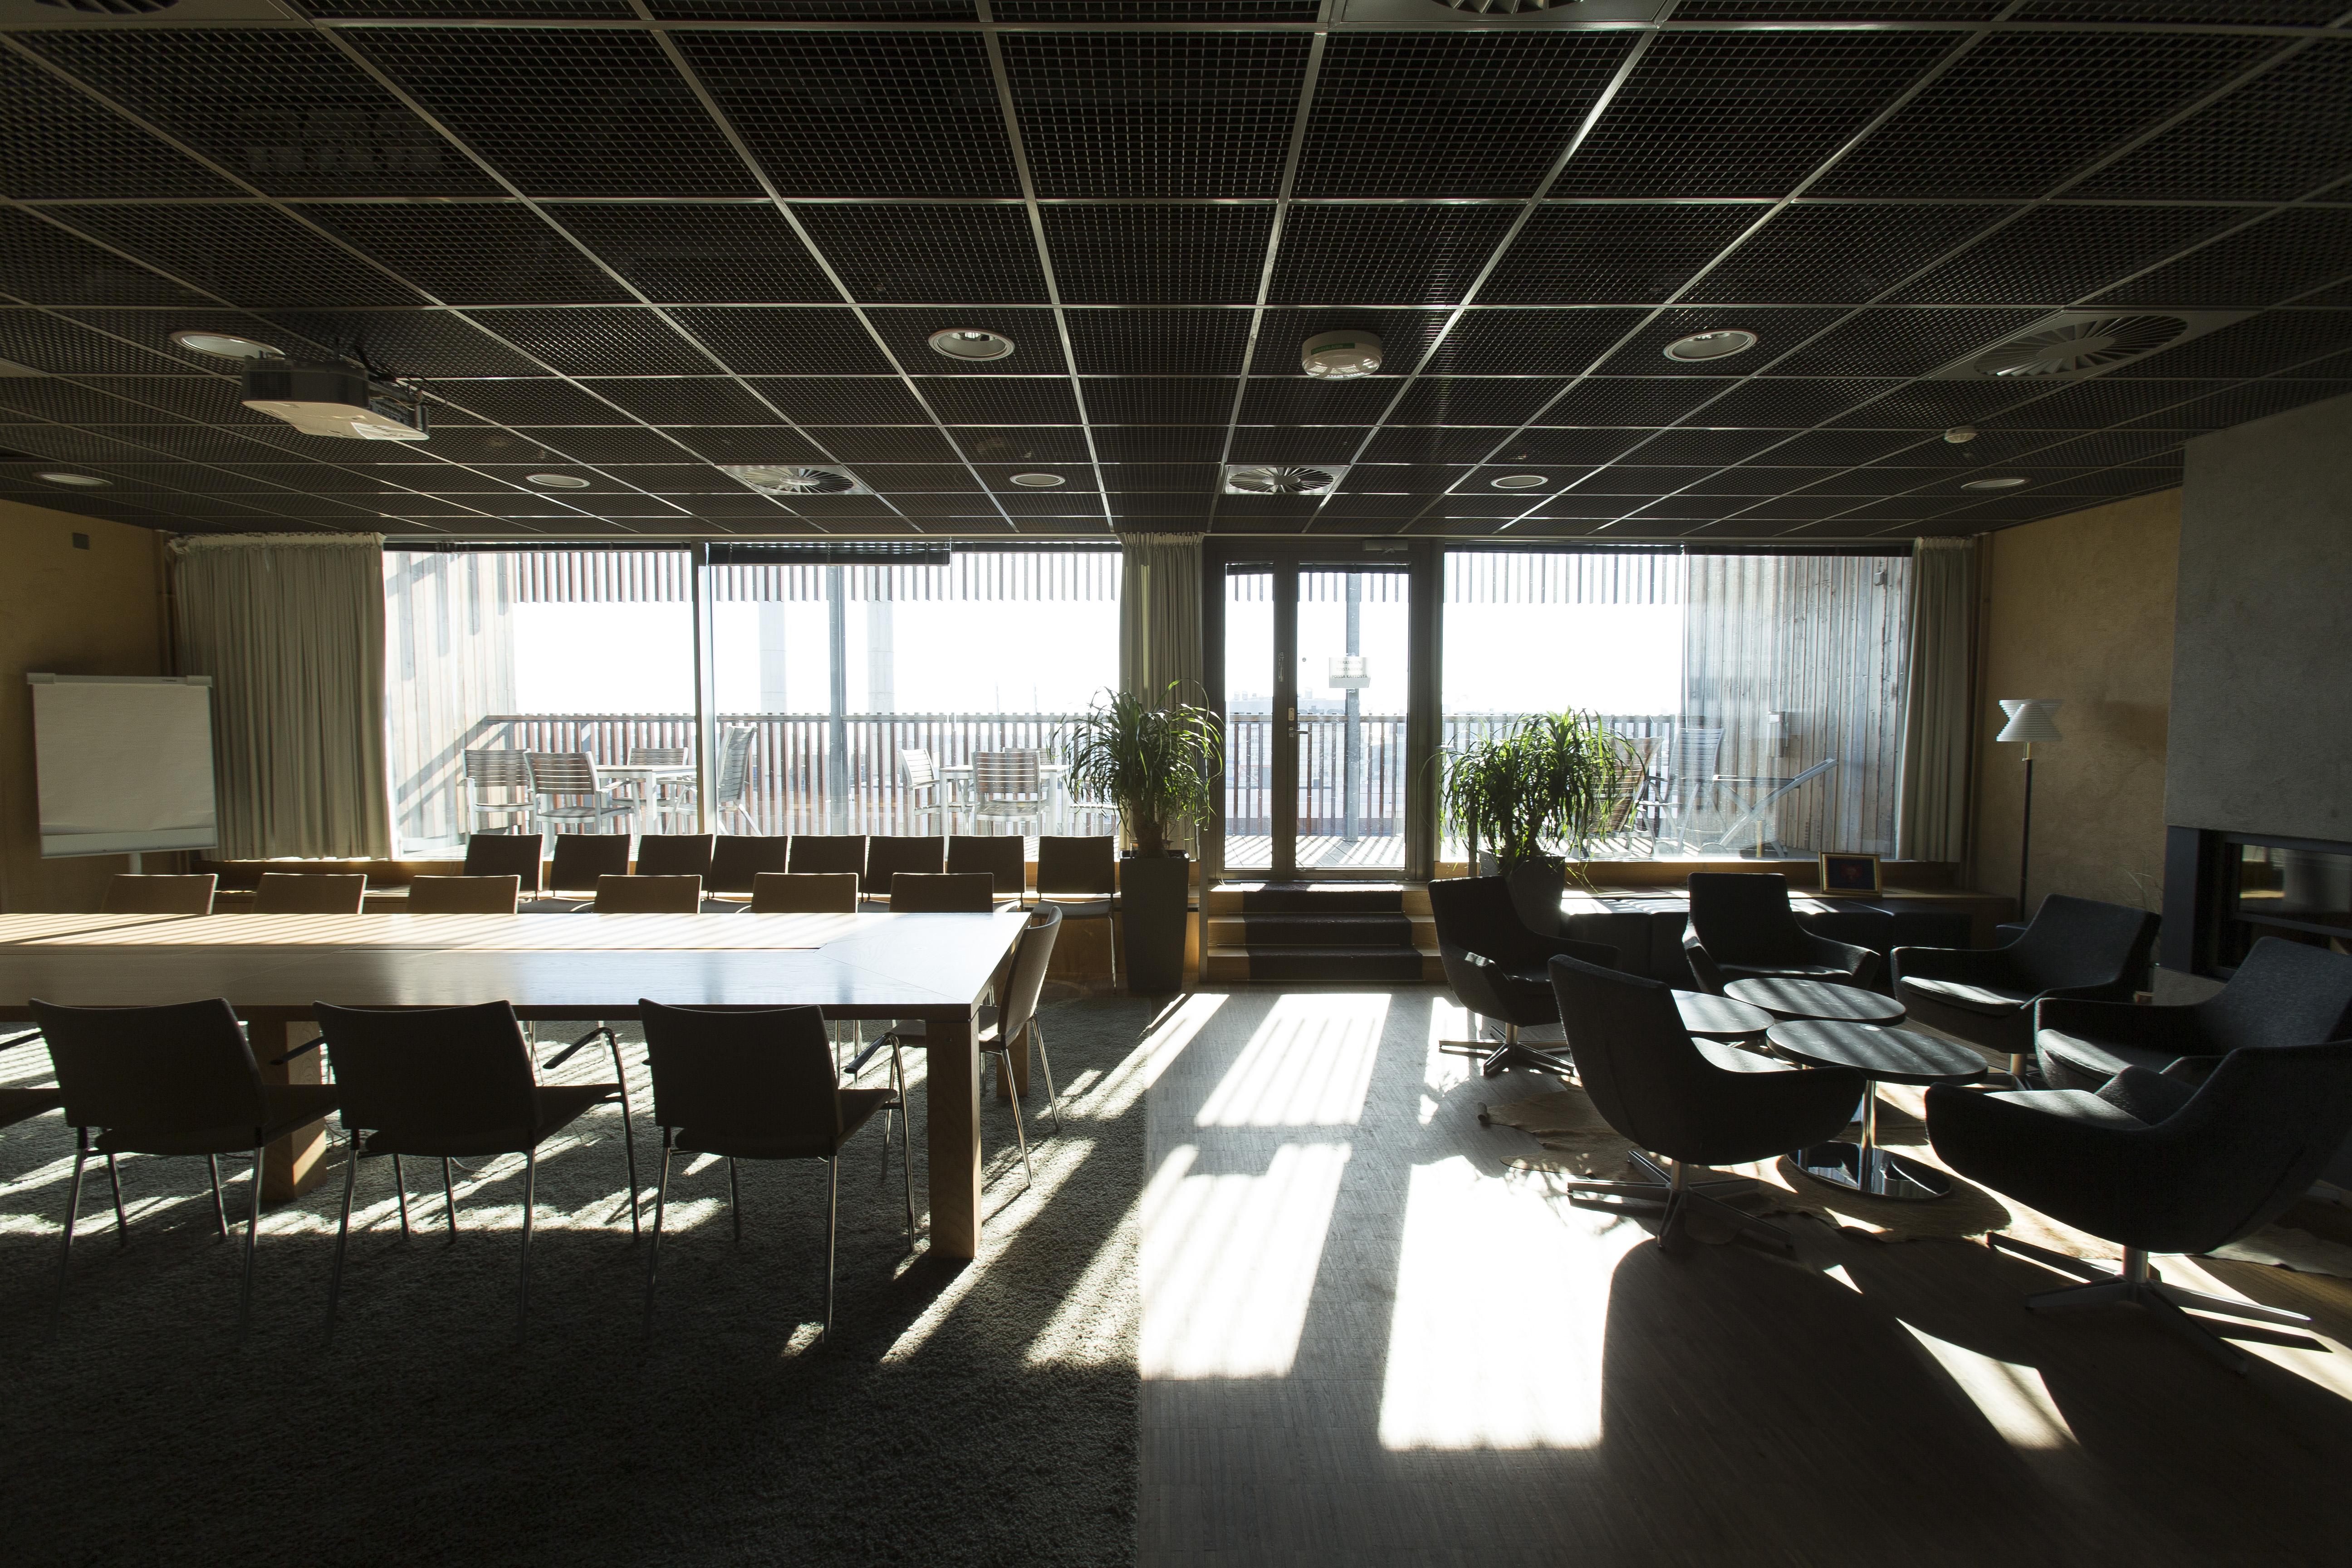 Porkkalankatu 24, Ruoholahti, Helsinki